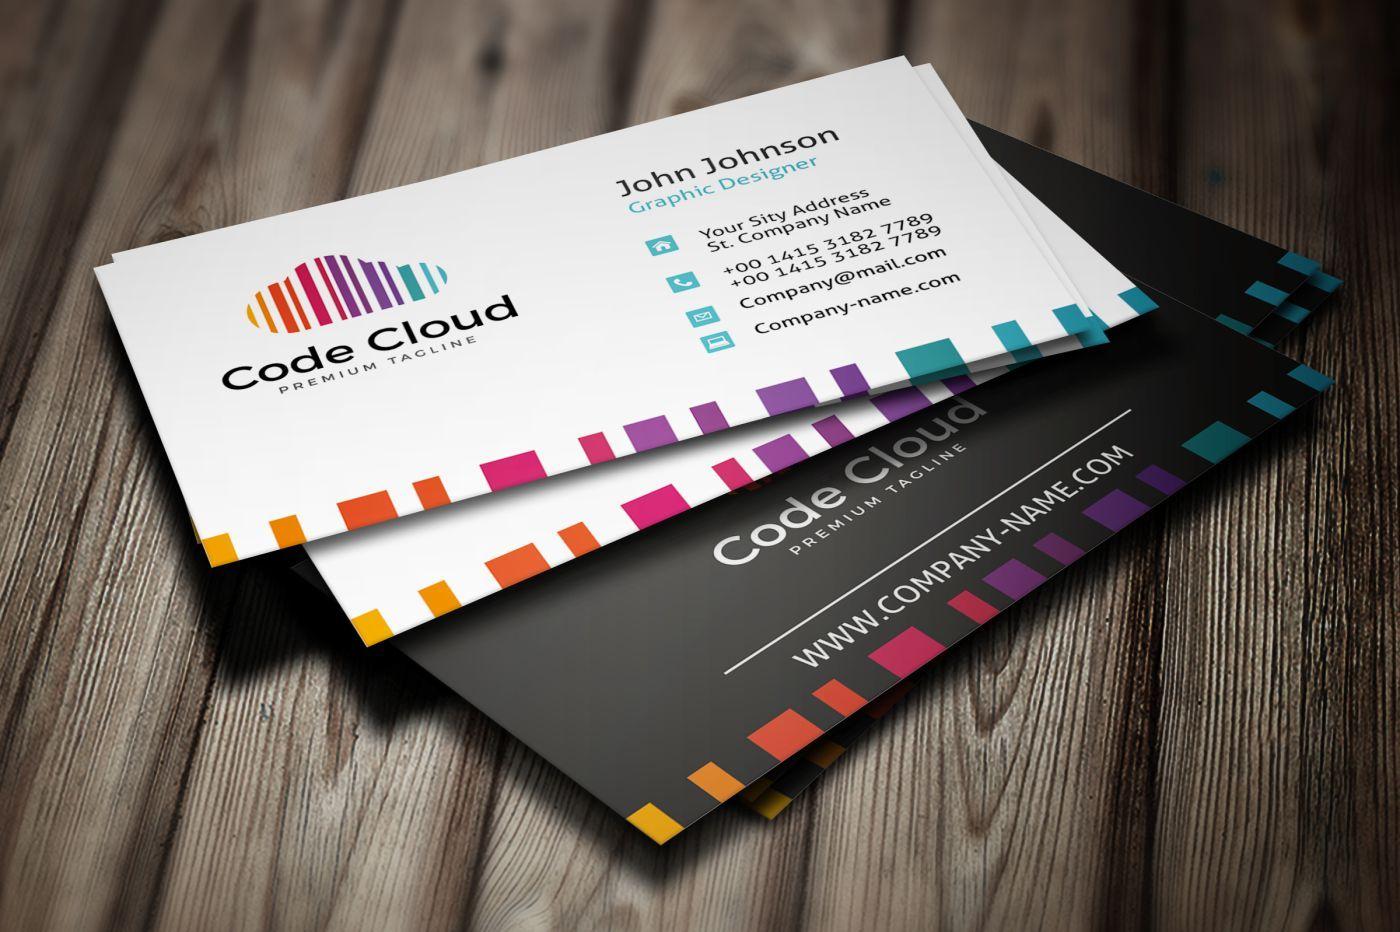 Code Cloud Business Card Corporate Identity Template Business Cards Corporate Identity Colorful Business Card Corporate Identity